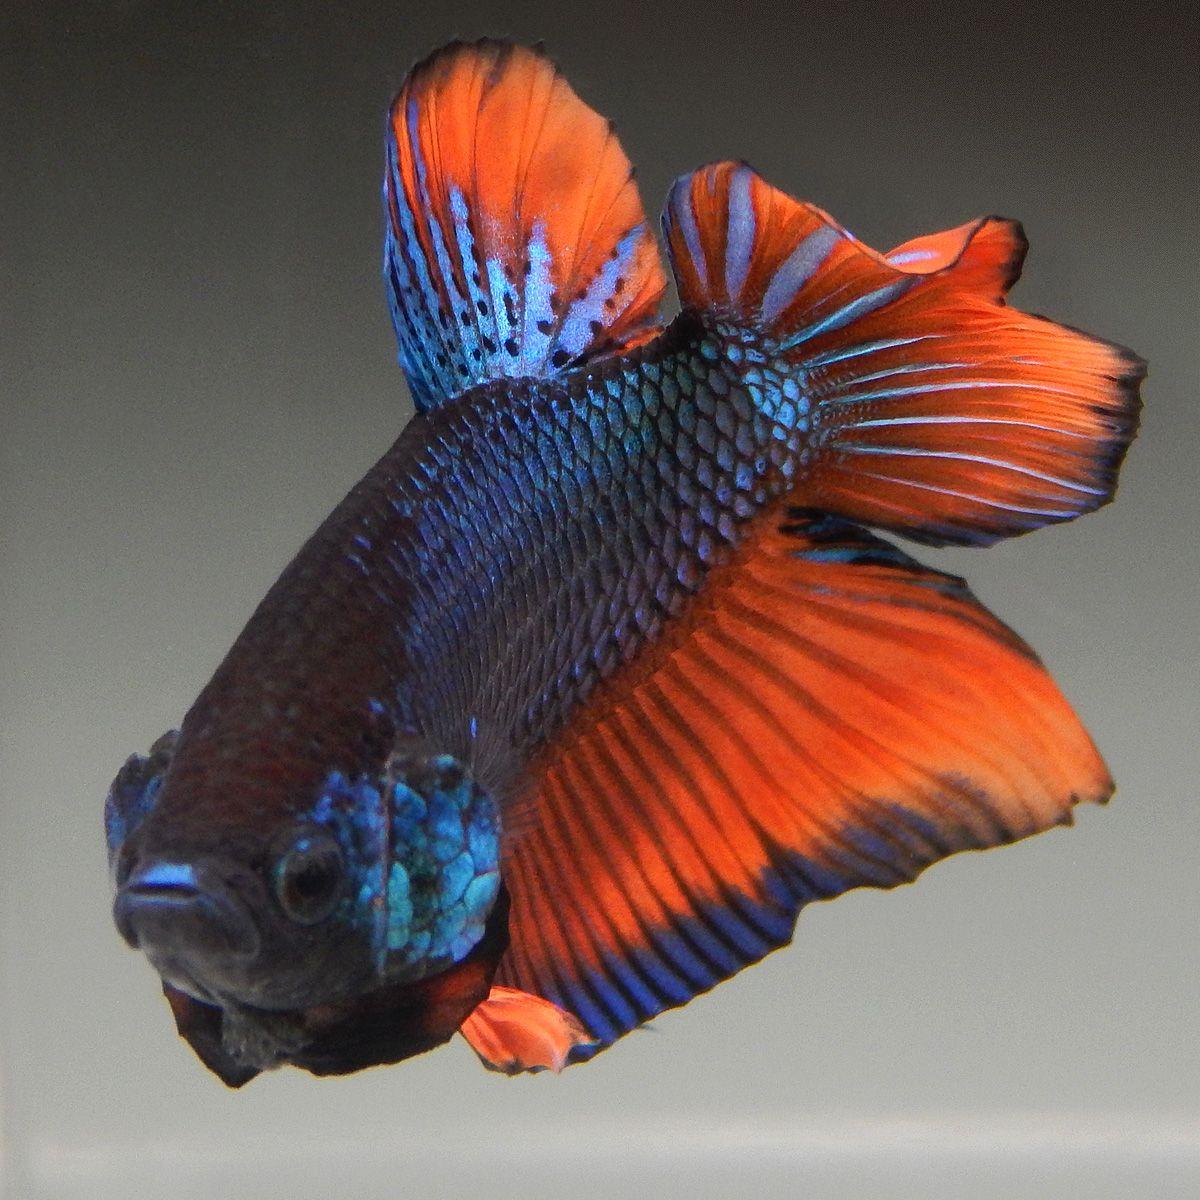 Live Betta Fish (Male) ORANGE METALLIC TURQUOISE FANCY PLAKAT ...